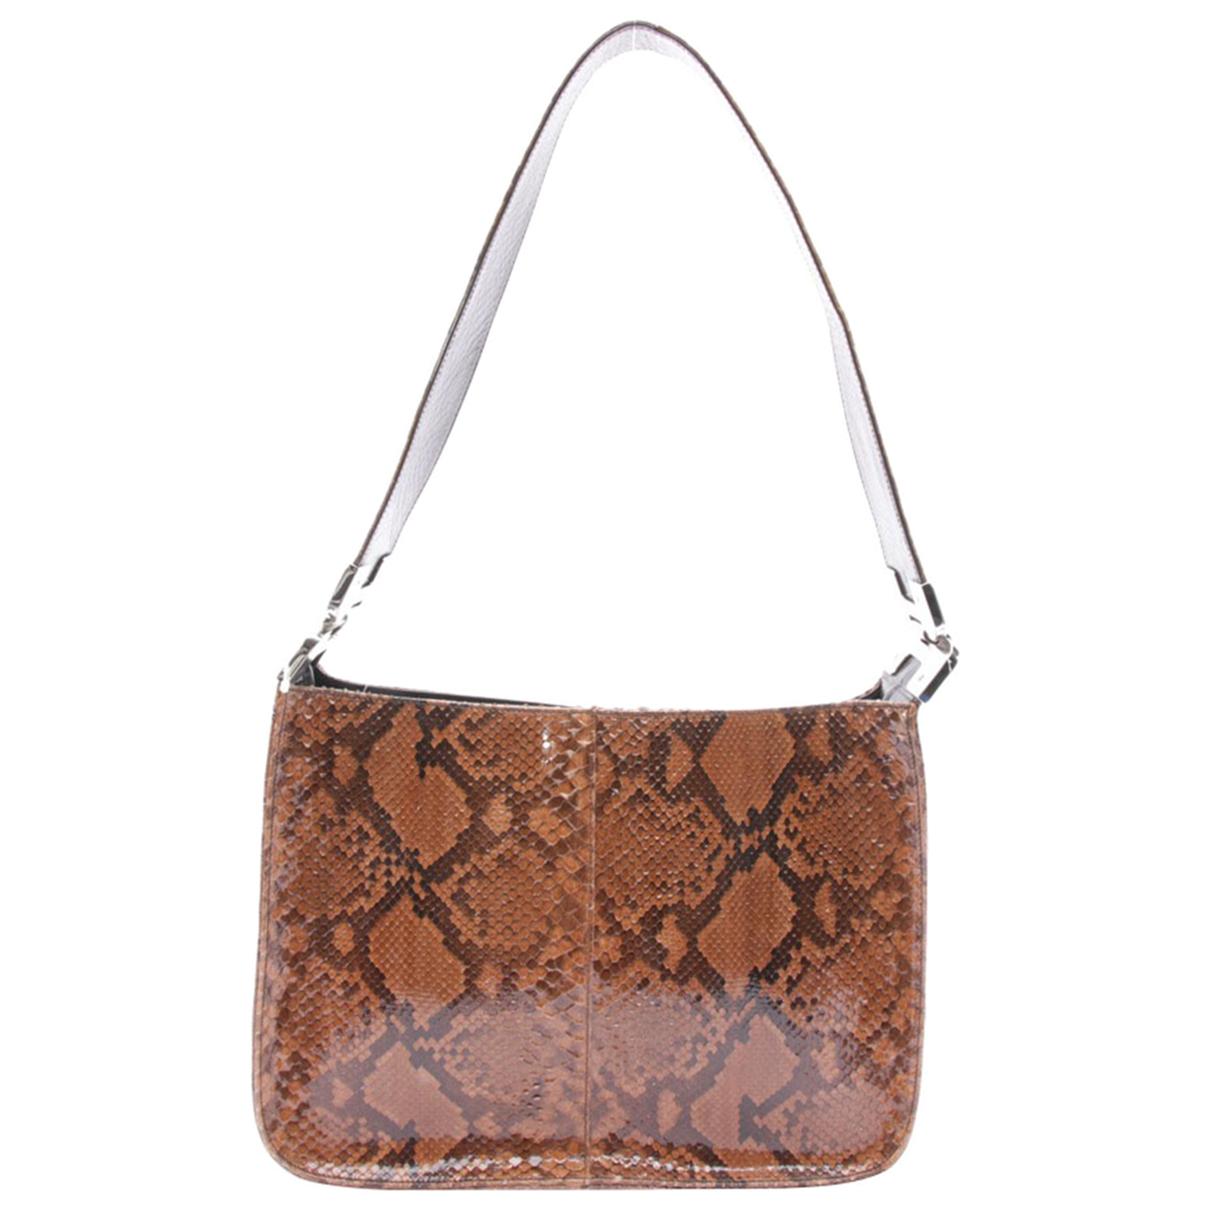 Prada \N Beige Leather handbag for Women \N